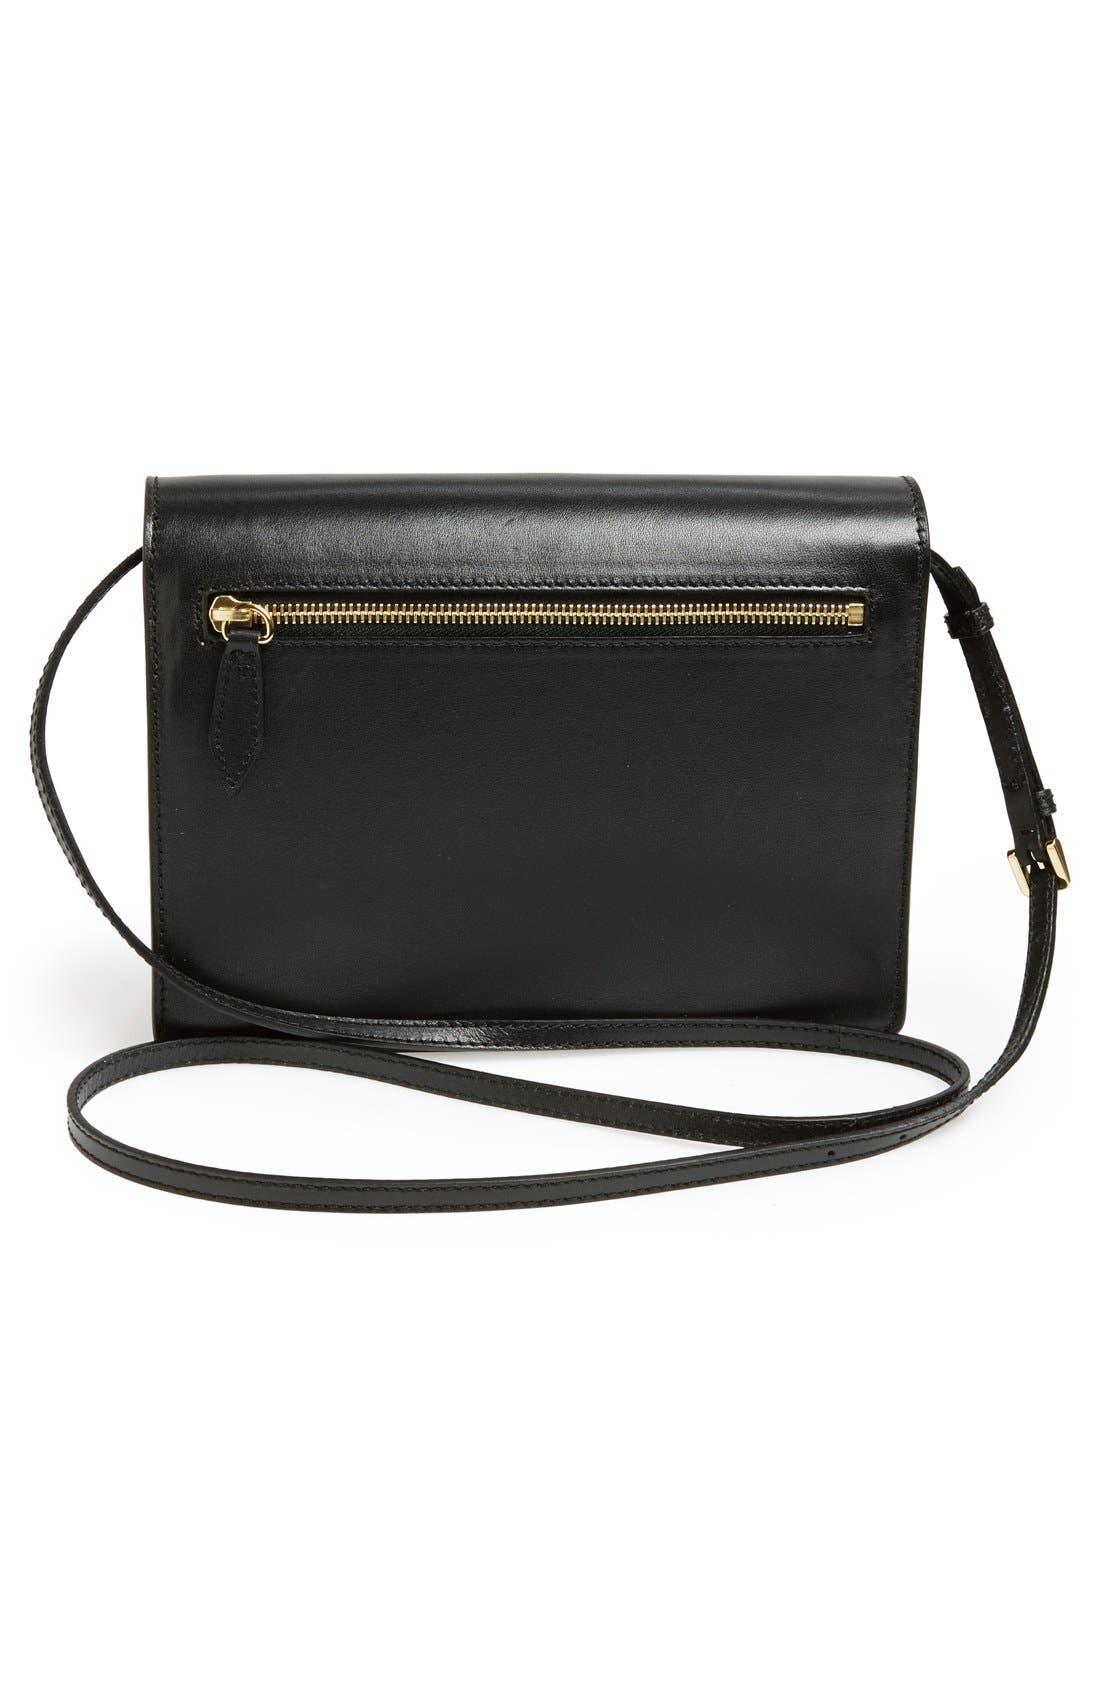 Alternate Image 3  - Burberry 'Small Macken' Crossbody Bag